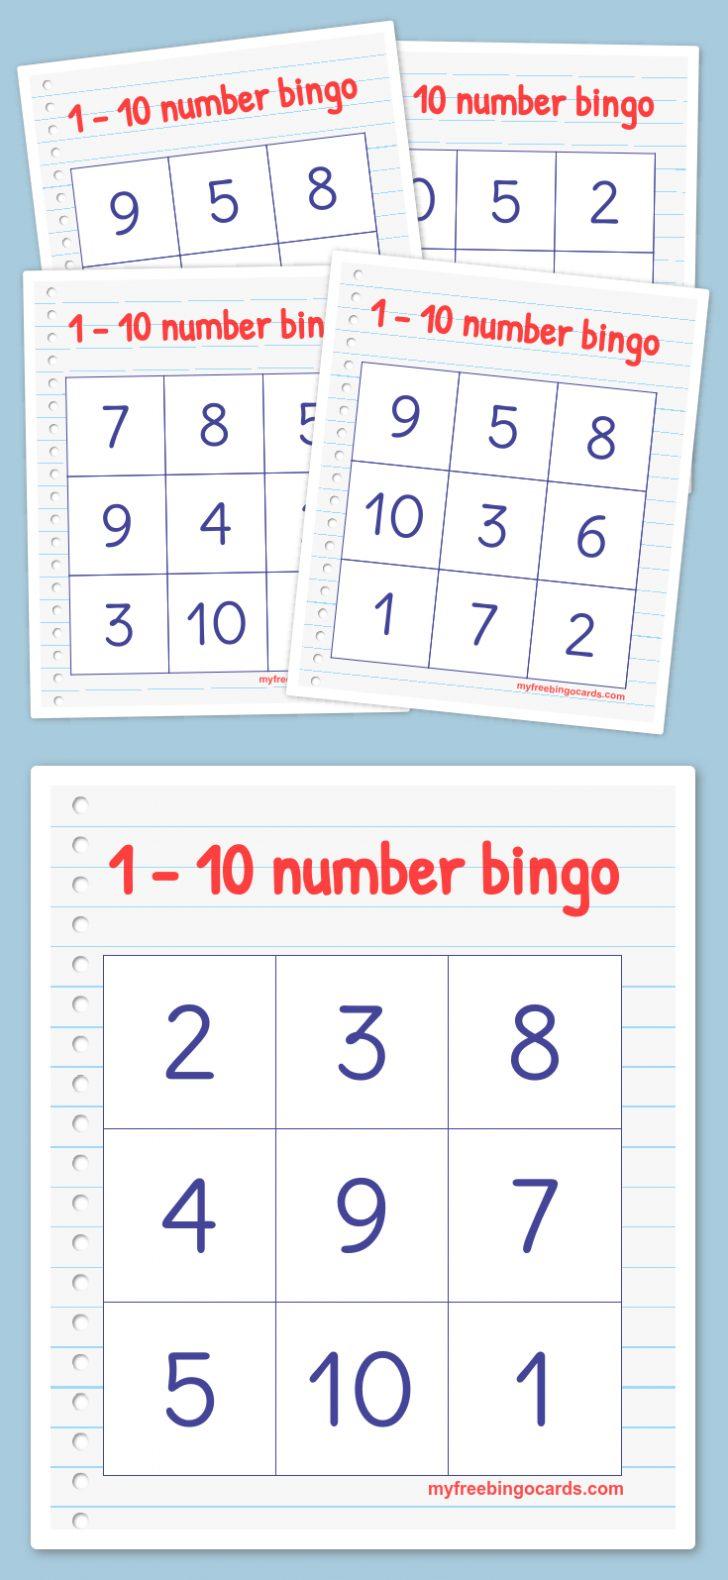 Printable Bingo Cards 1-10